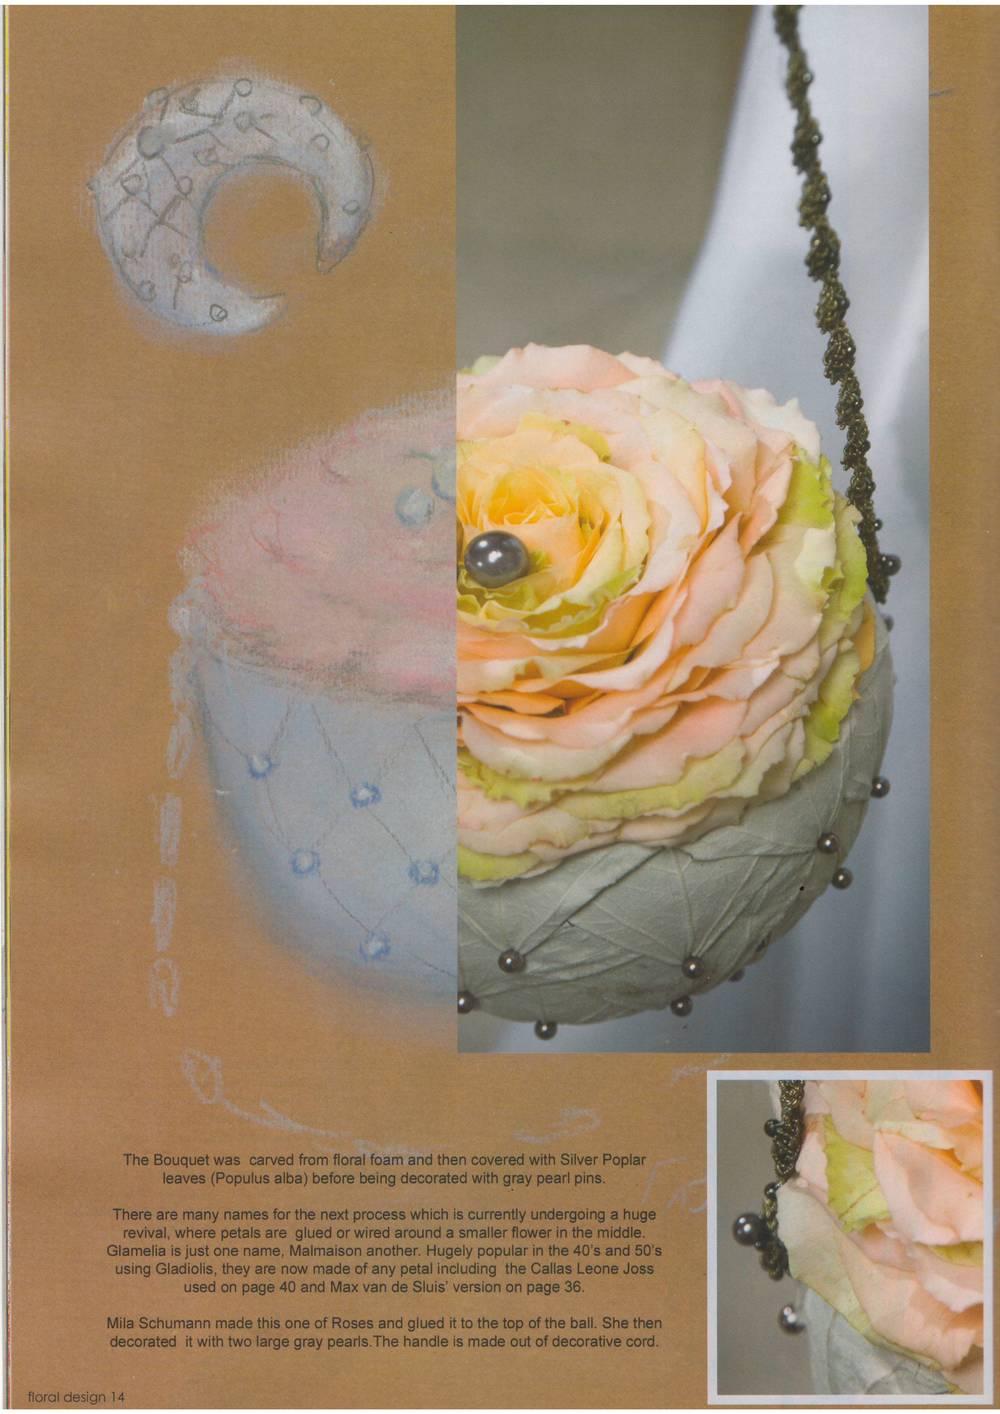 журнал 14.JPG